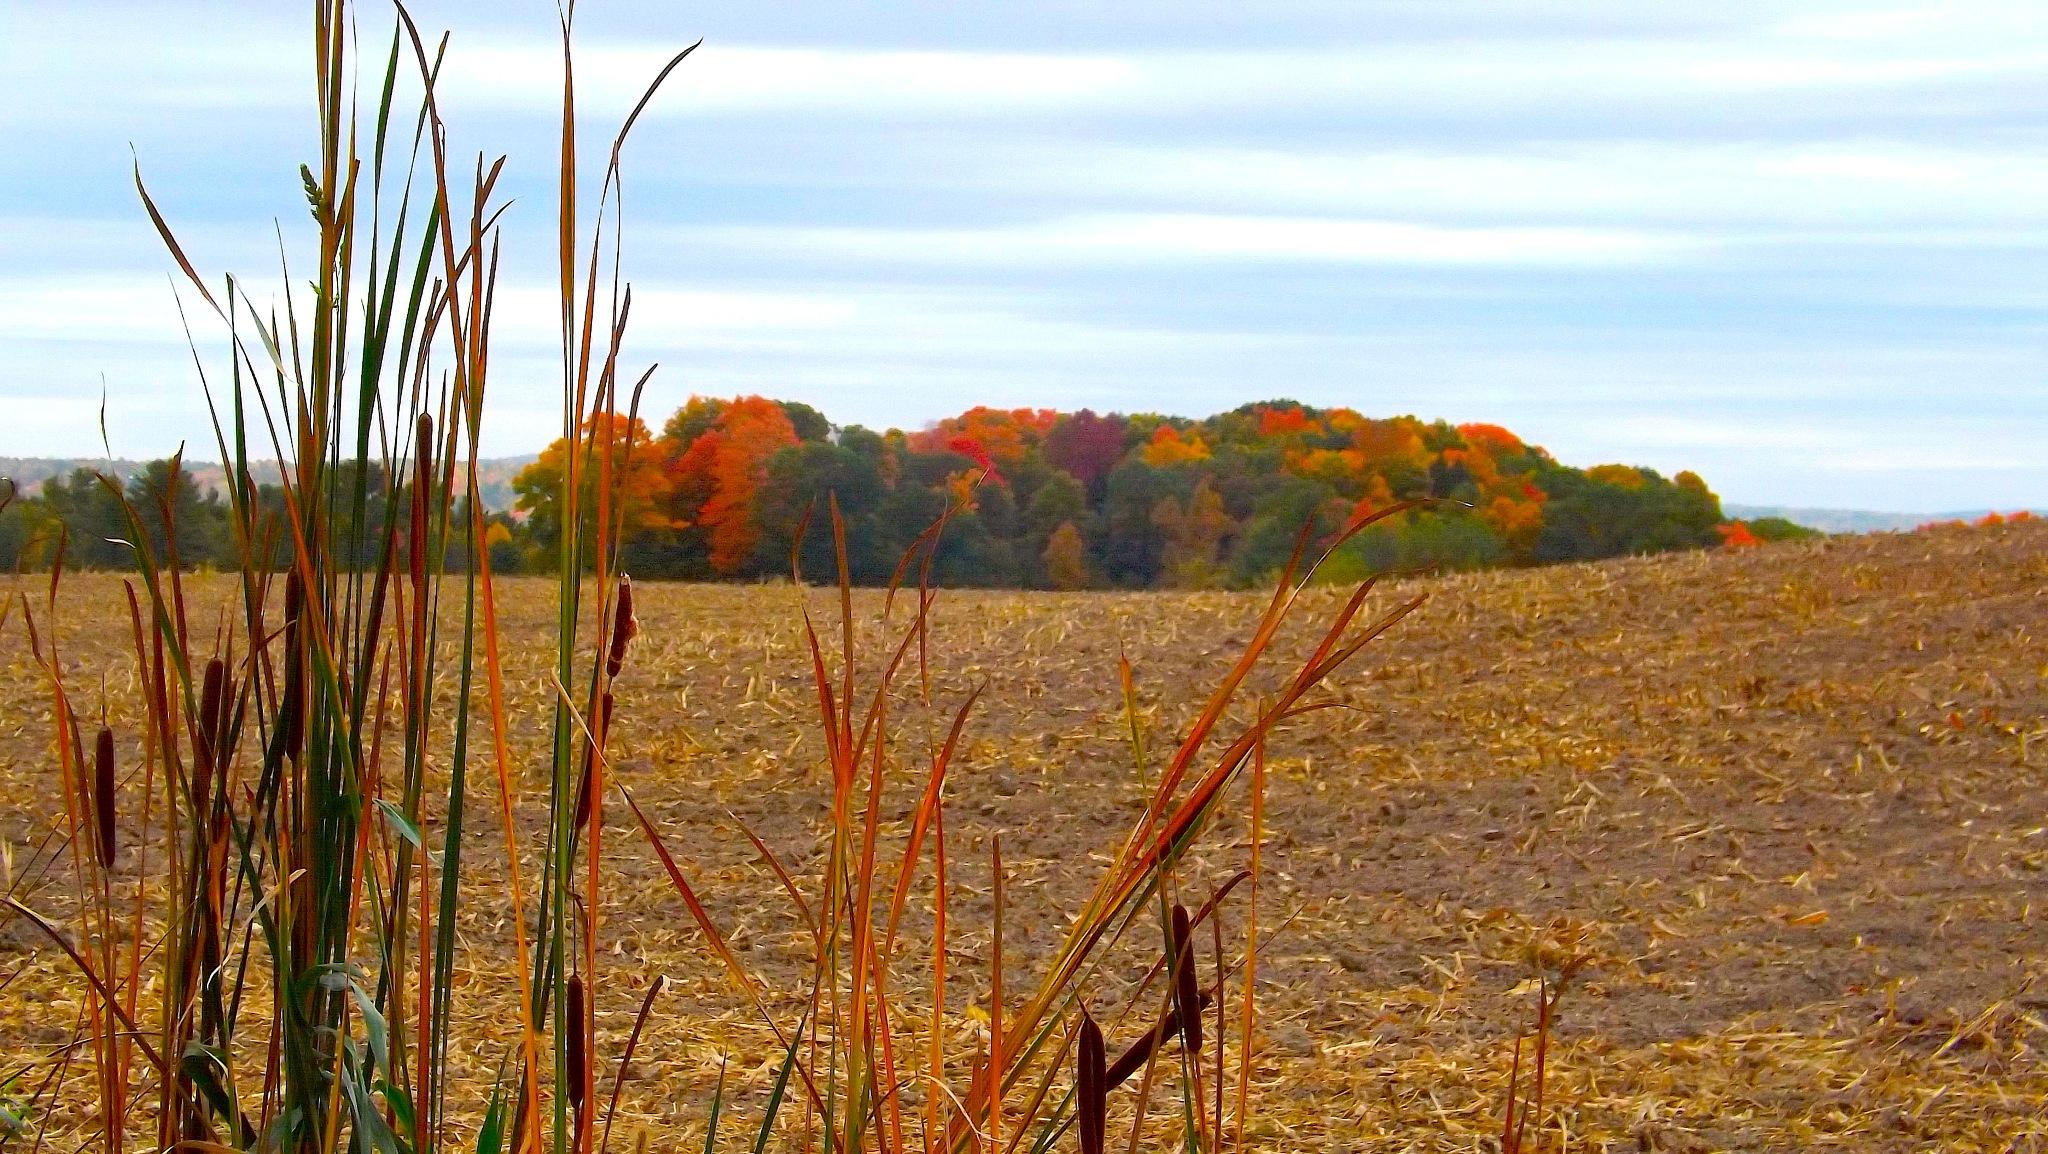 Foliage Across the Cut Cornfield by ccbarron1